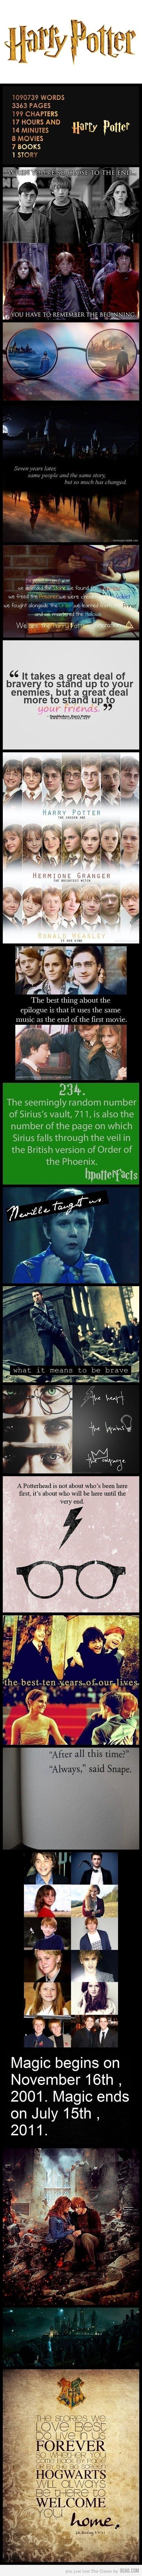 Harry Potter generation! i just cryed!